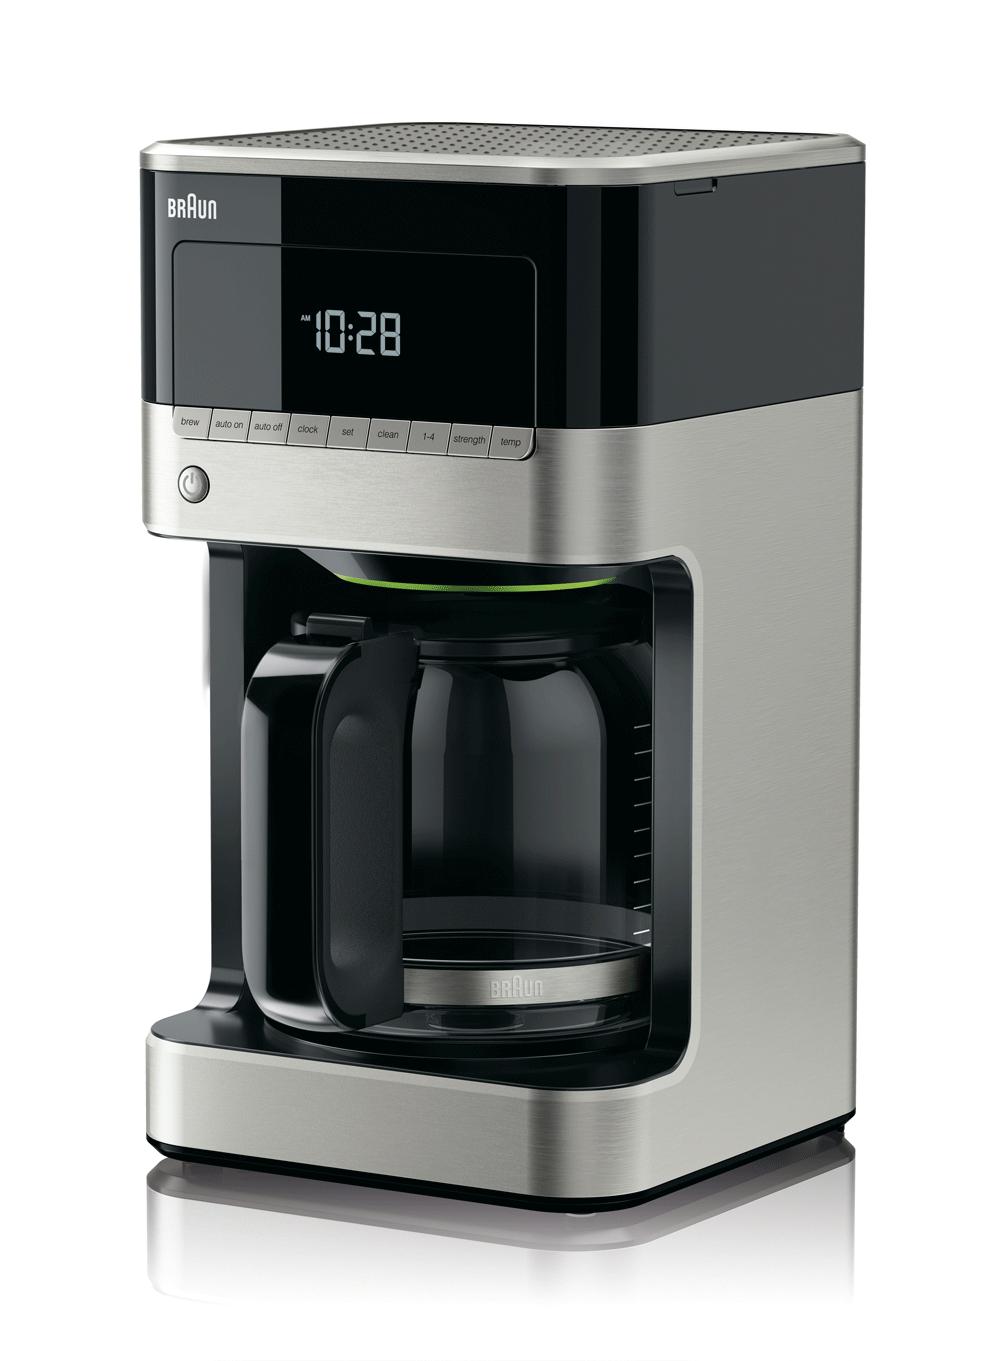 Braun Brew Sense Coffee Maker from Bloomingdale's